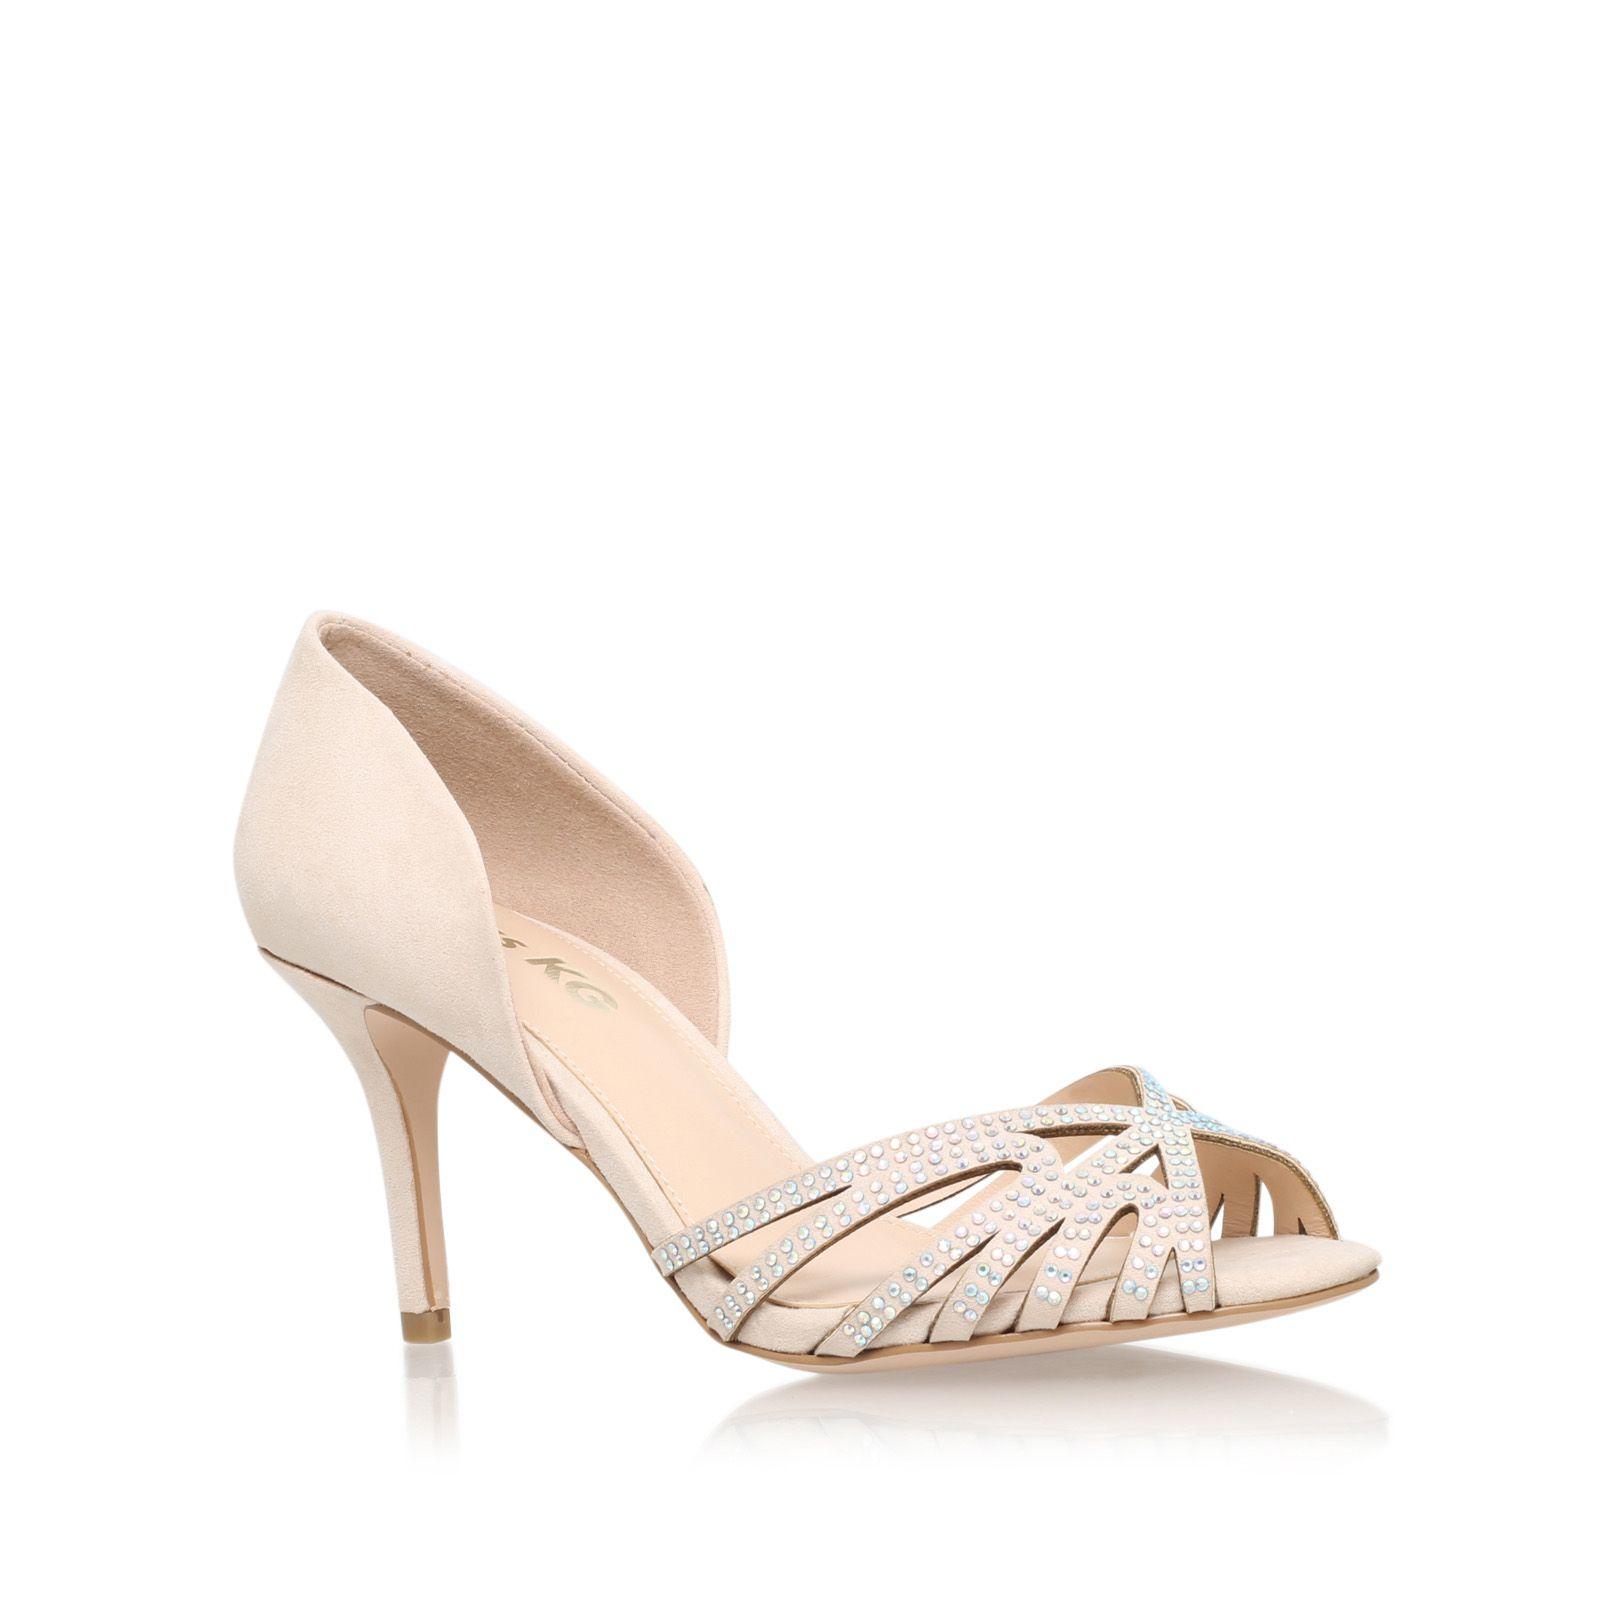 PHILIPPA2 Miss KG Philippa2 Nude Mid Heel Sandals by MISS KG